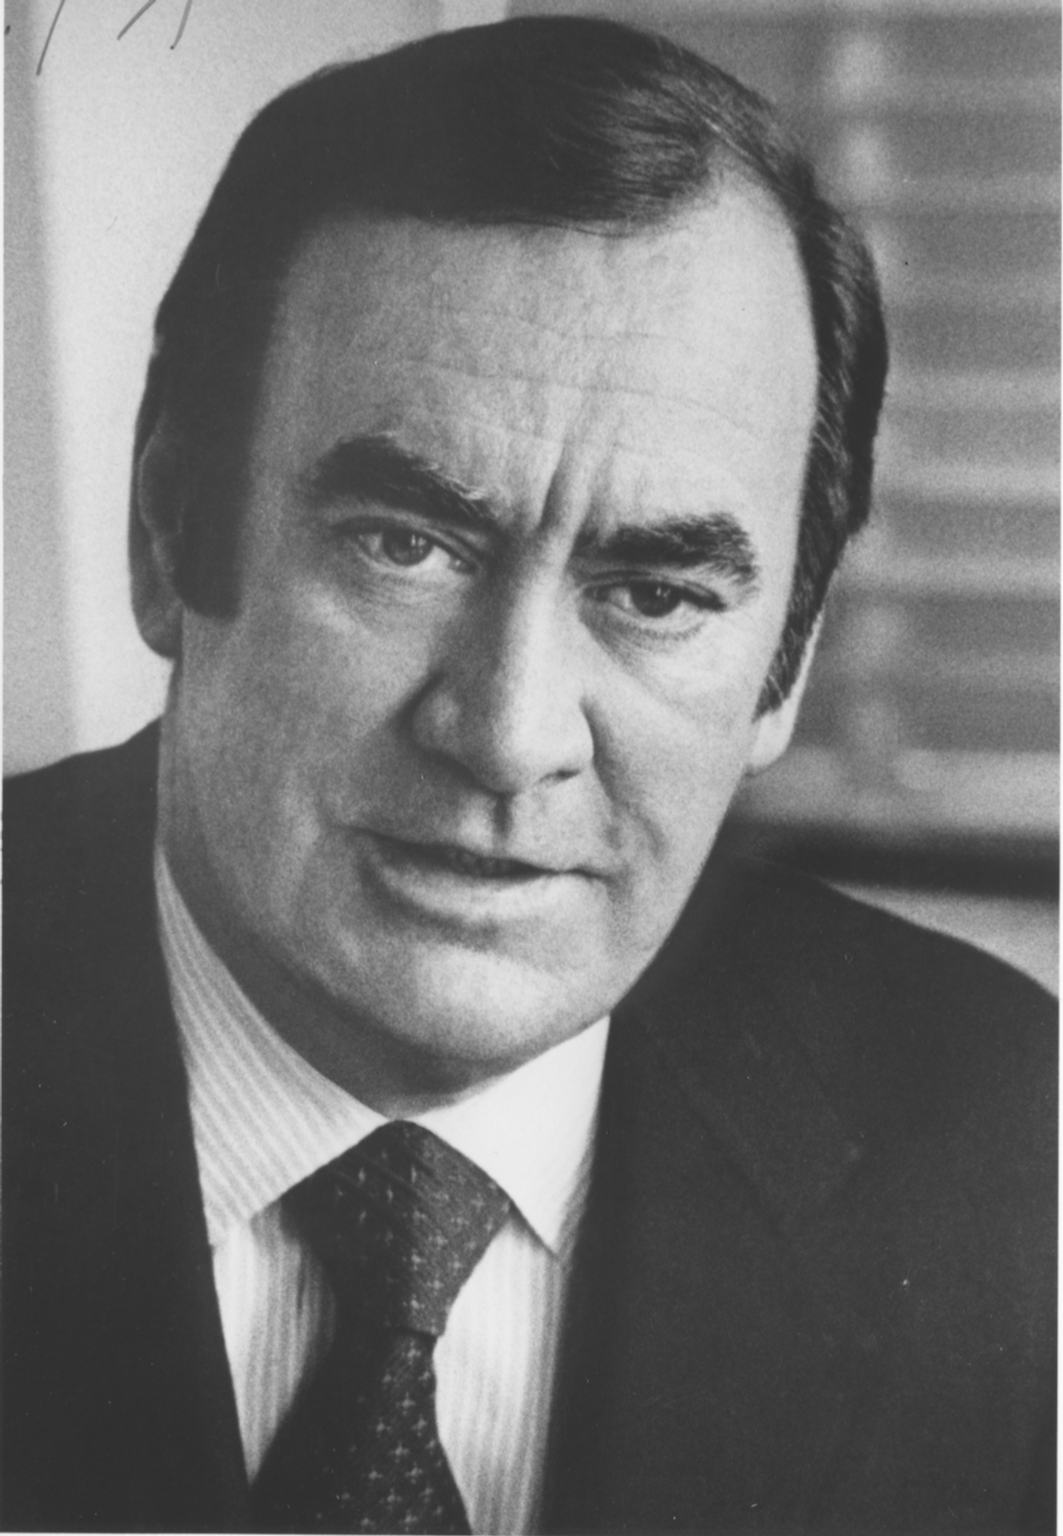 Hugh L. Carey